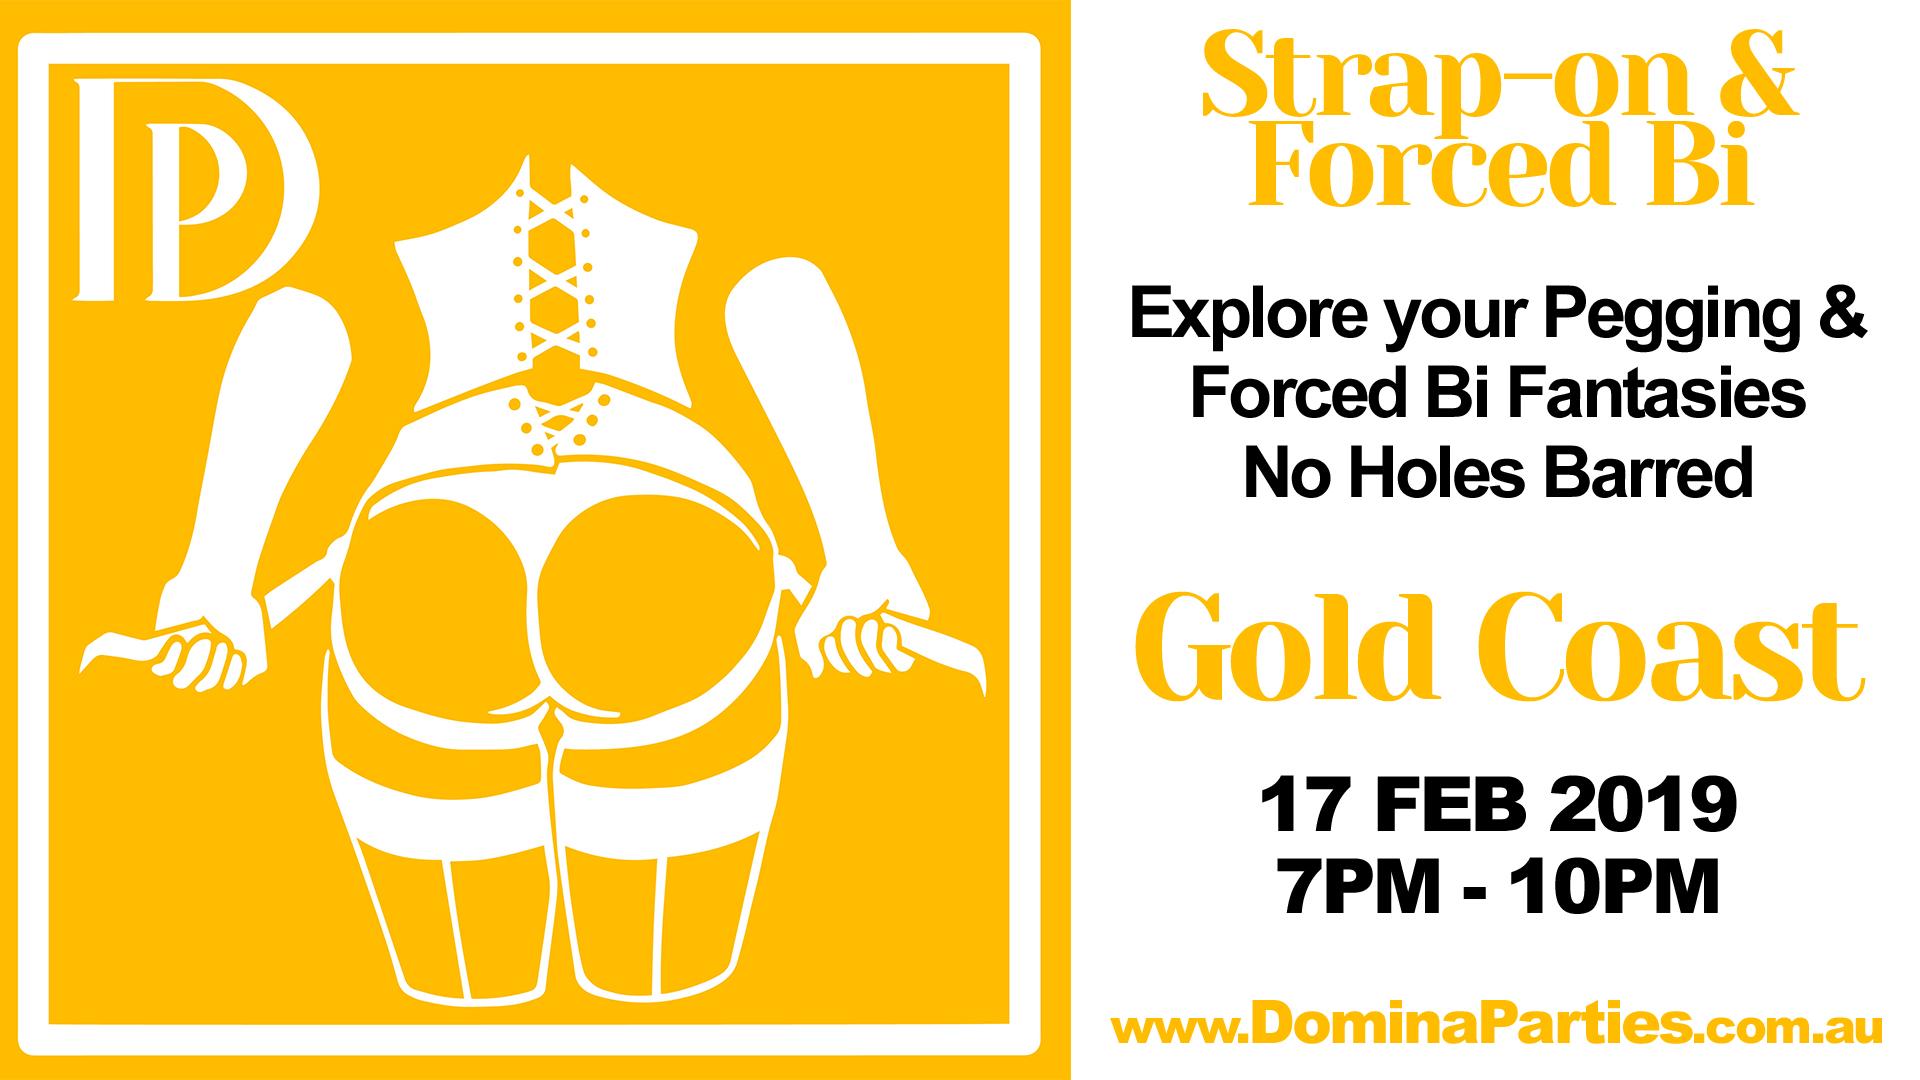 Strap-on & Forced Bi Party 8 July 2017